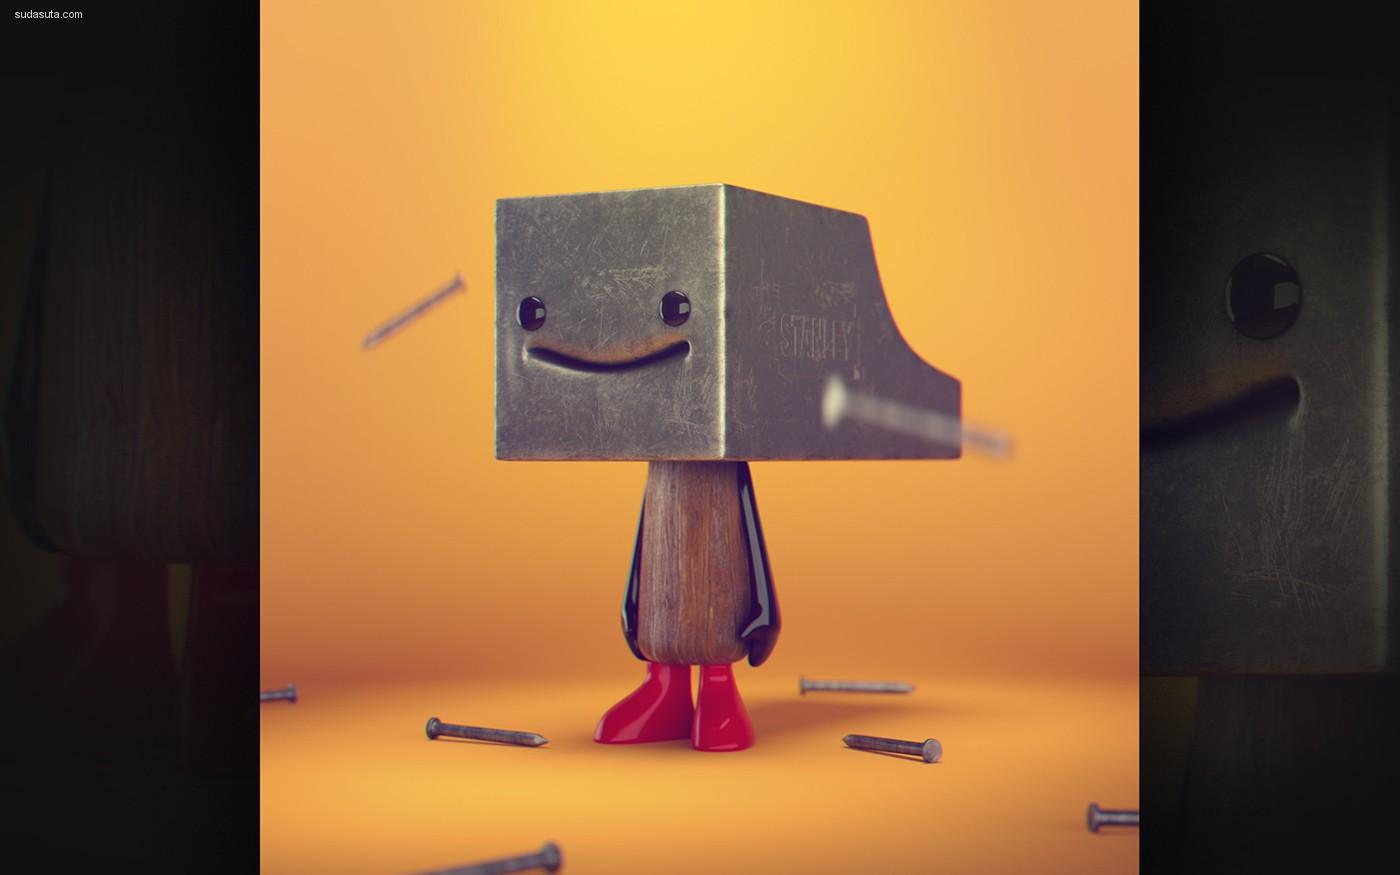 Zigor Samaniego 可爱的3D怪物造型设计